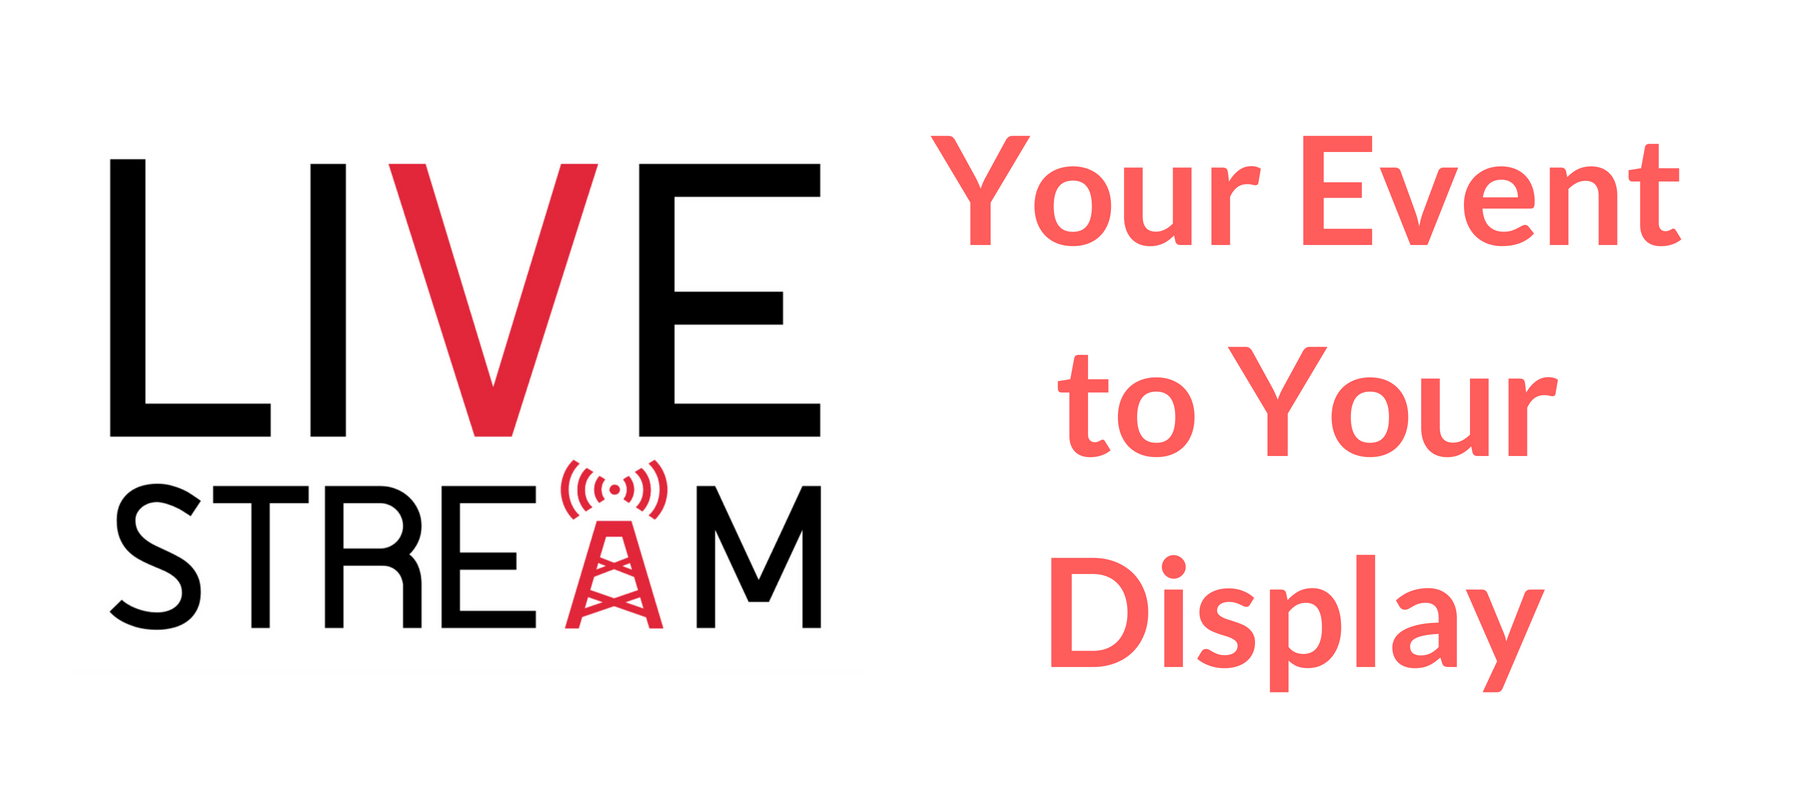 How to host a live stream